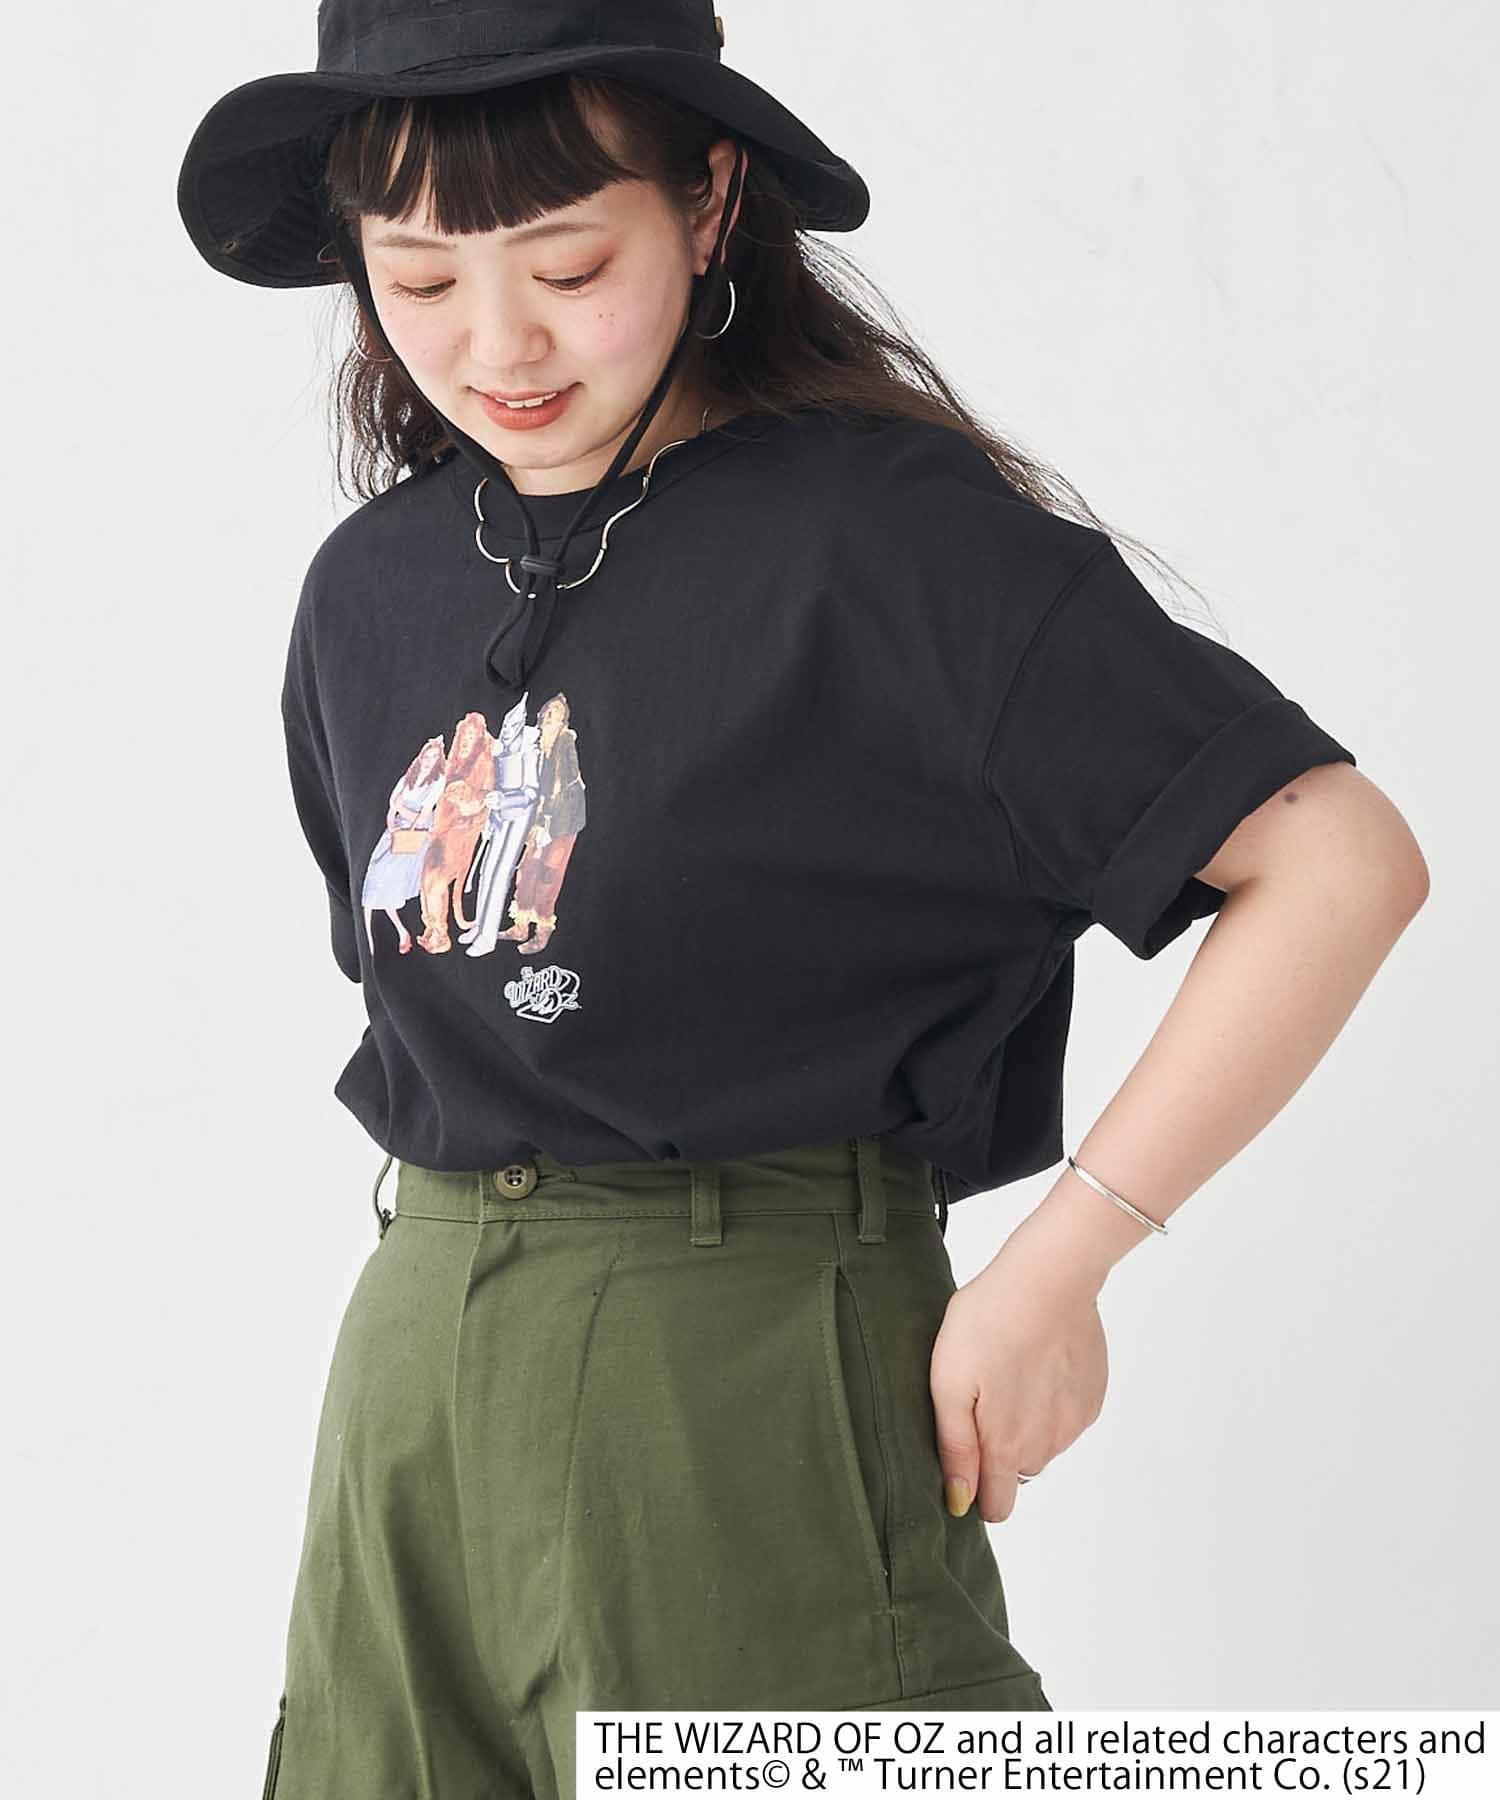 CPCM(シーピーシーエム) レディース 【オズの魔法使】集合写真T ブラック